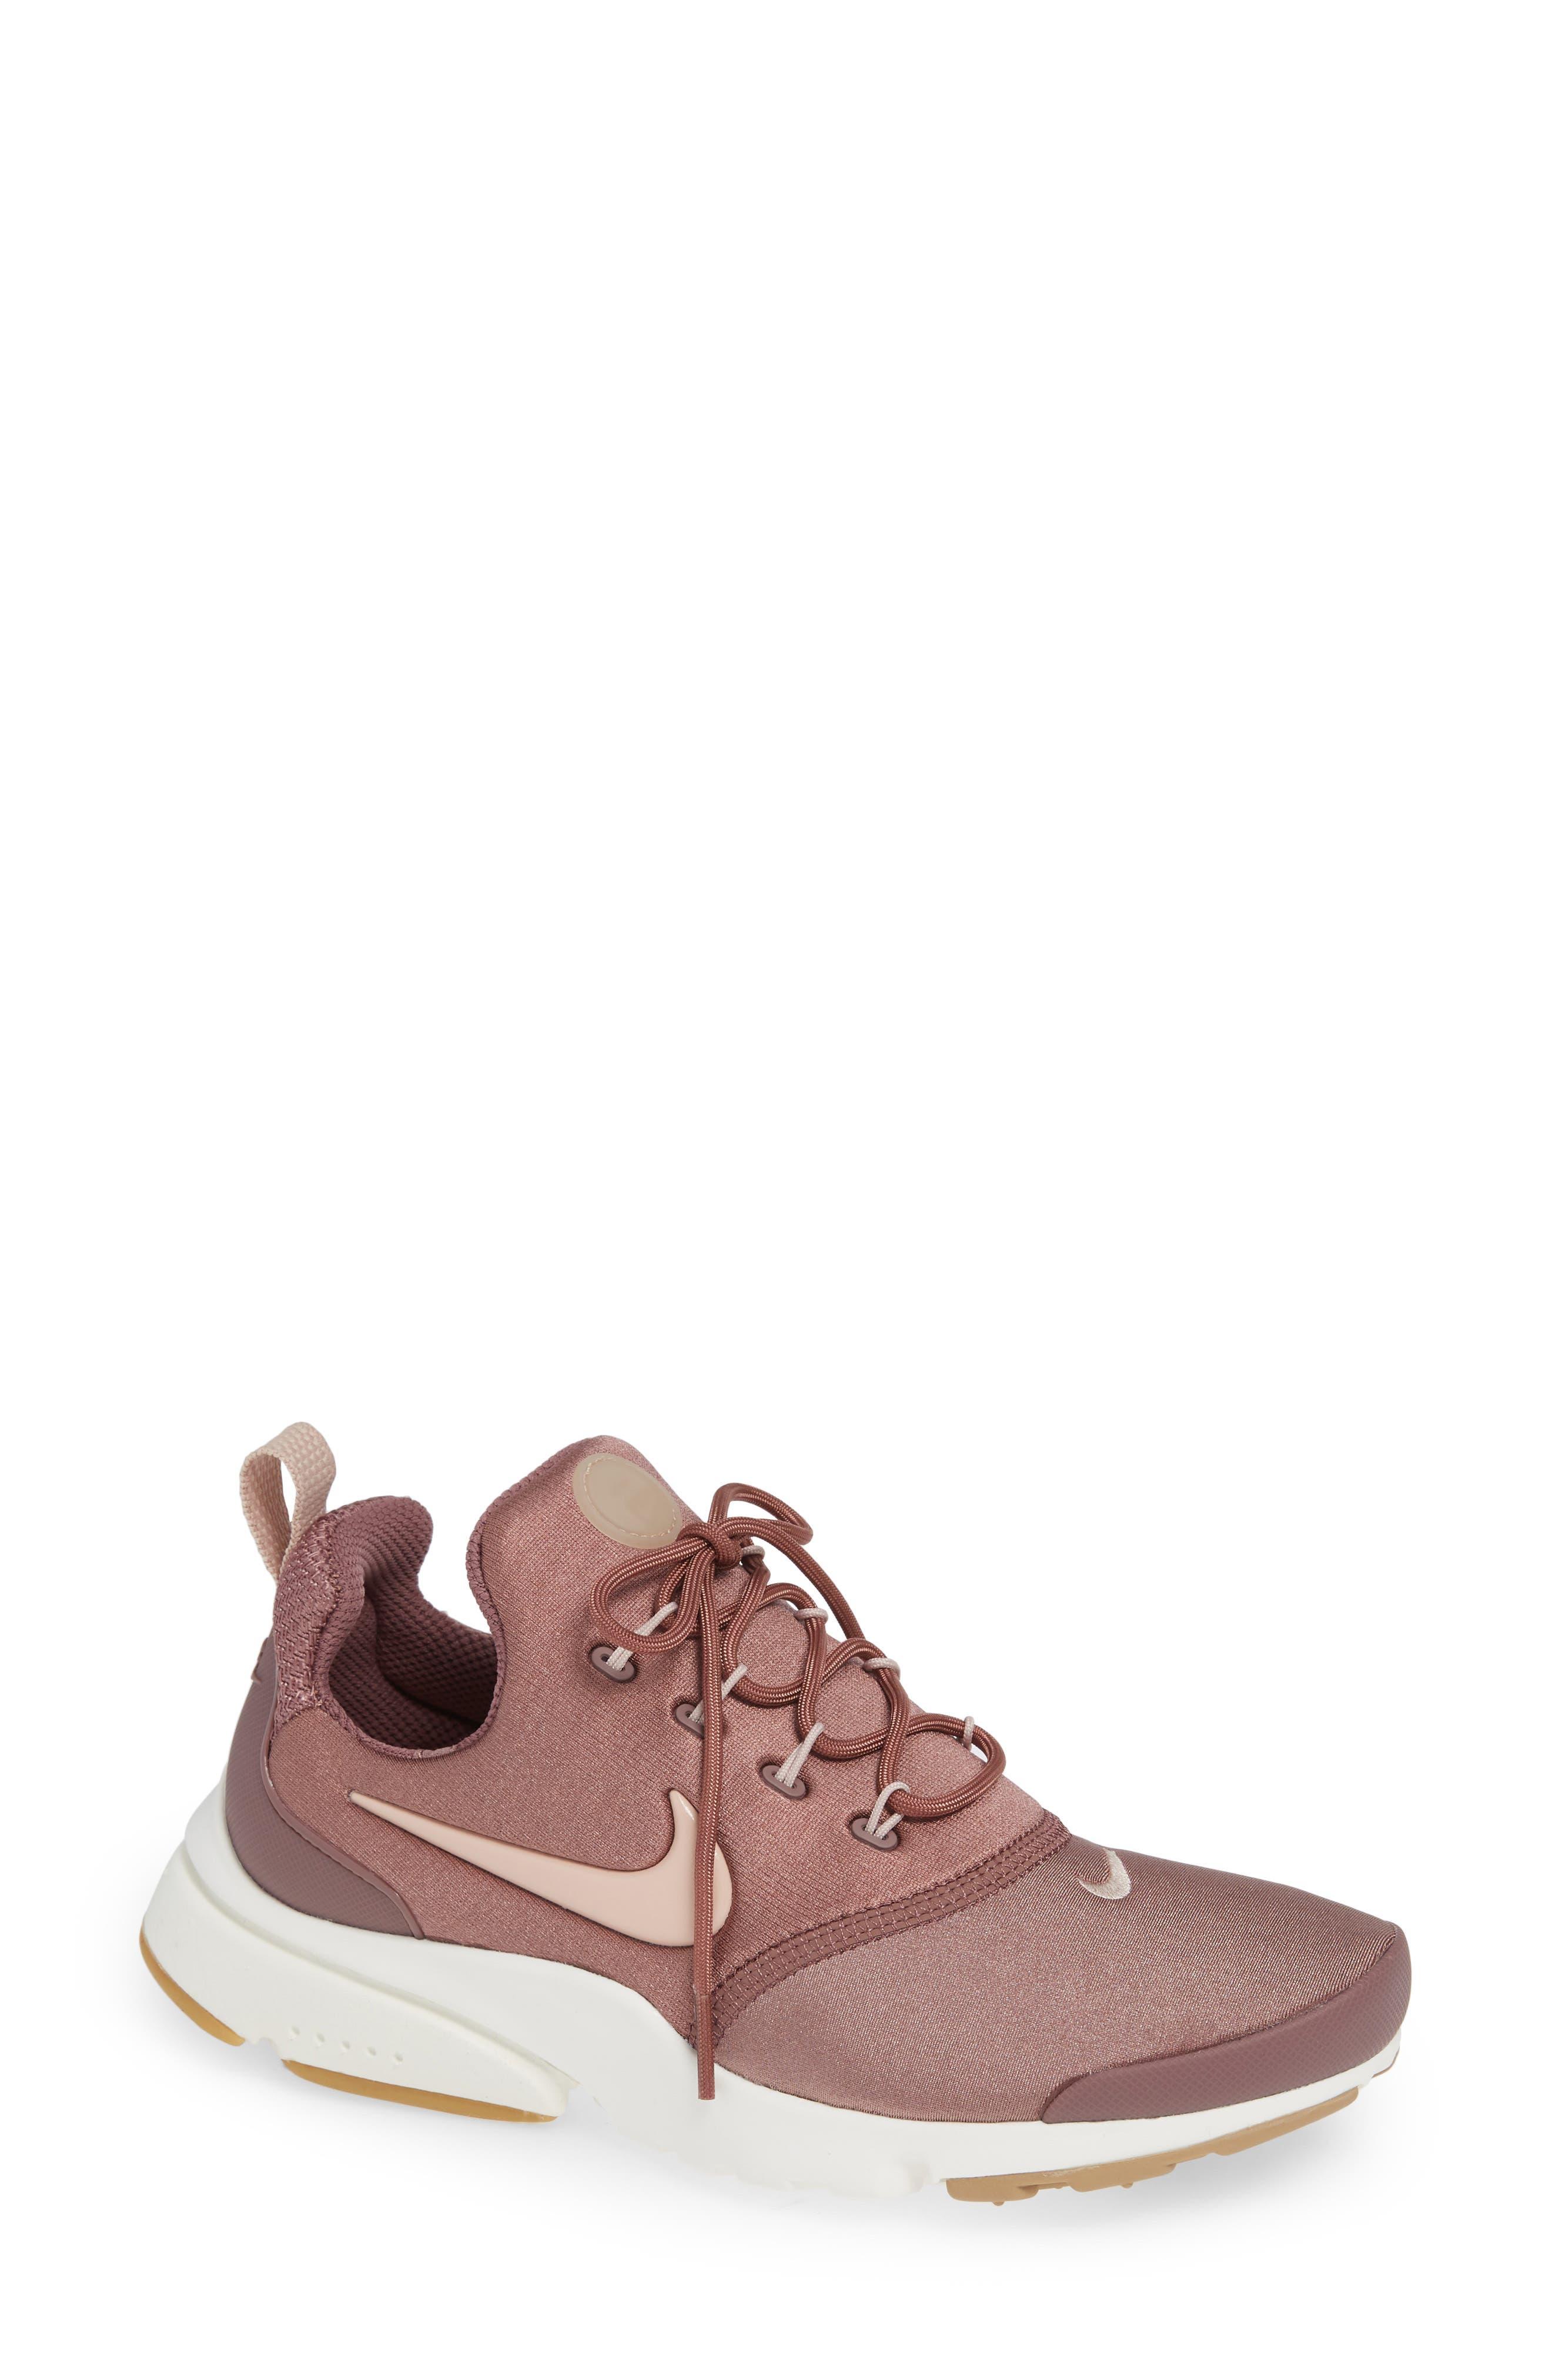 Presto Fly Sneaker in Smokey Mauve/ Particle Beige